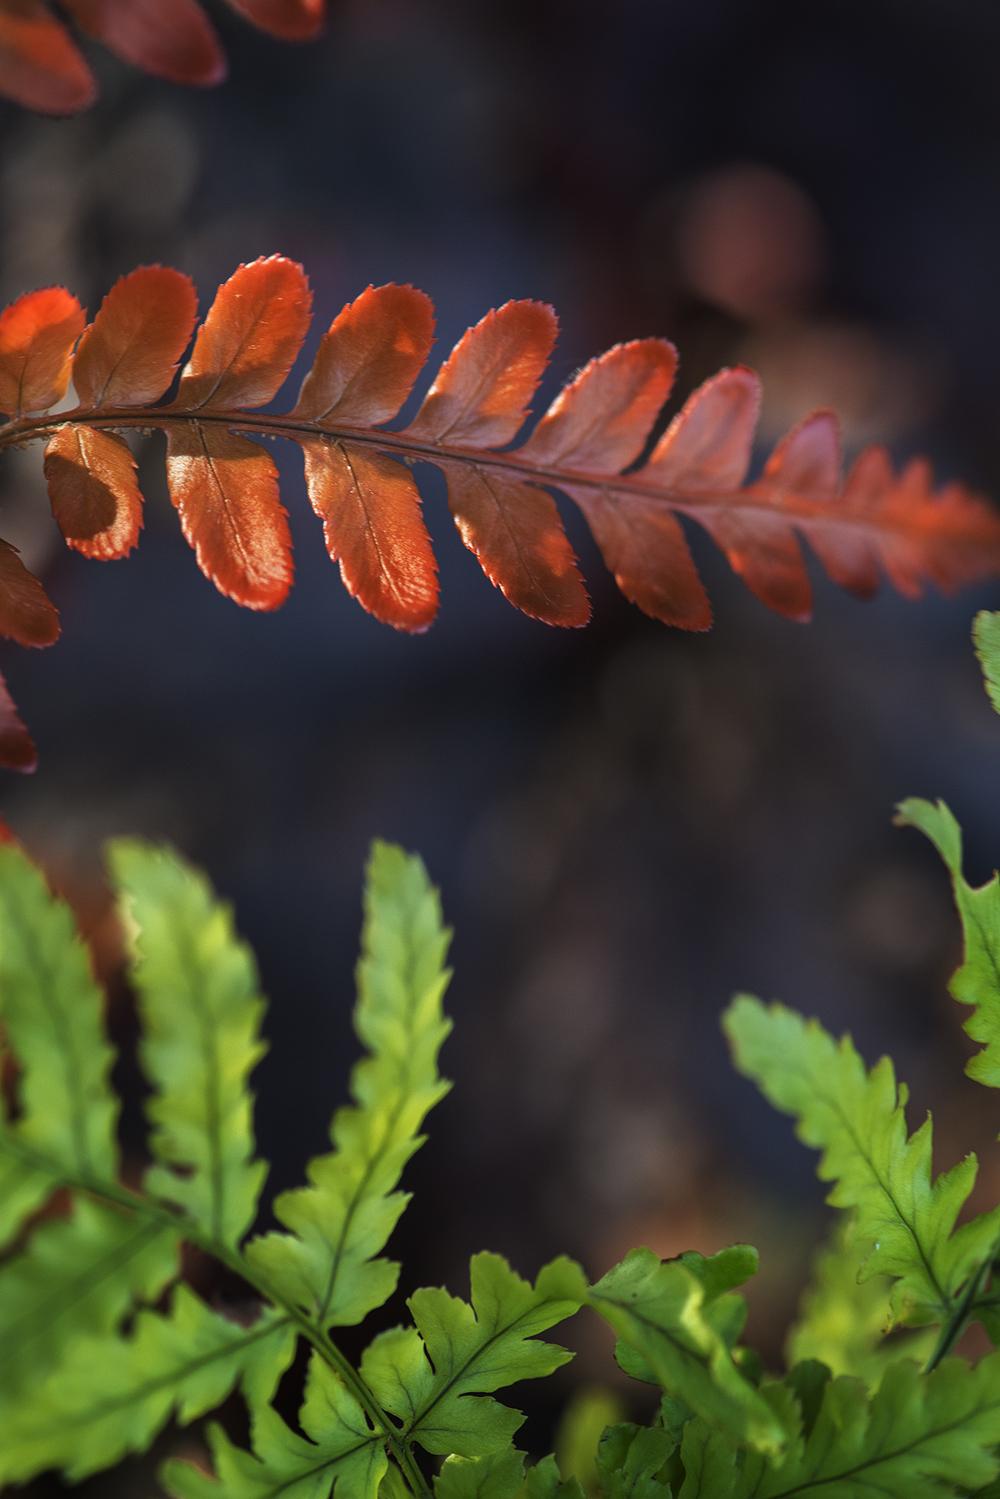 Dryopteris erythrosora 'Brilliance' (Autumn Fern)